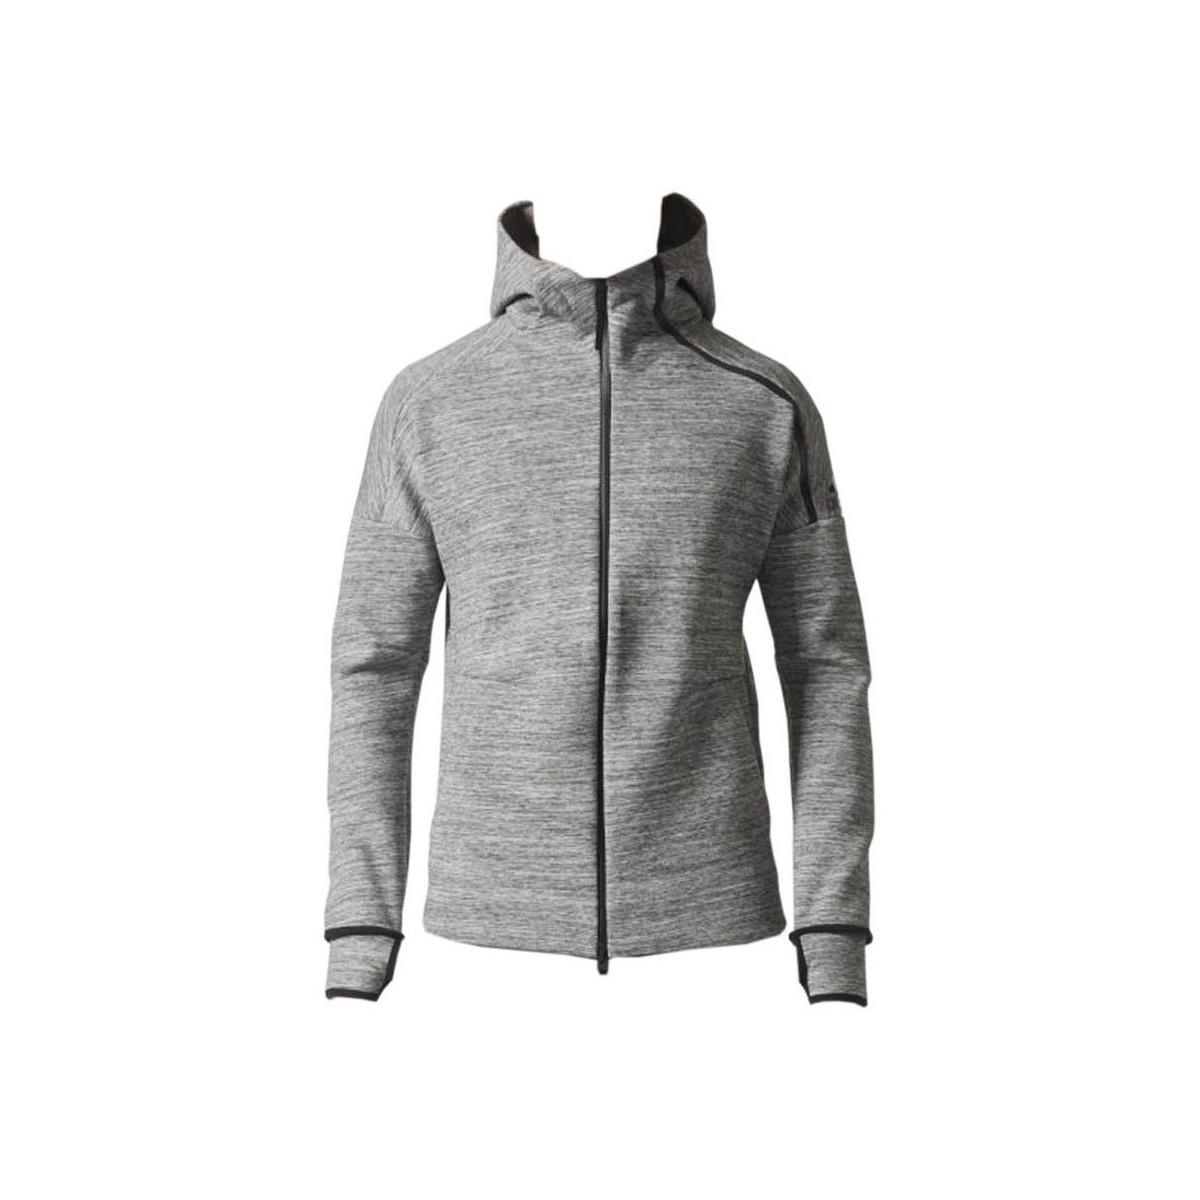 adidas Zne Storm Heather Men's Sweatshirt In Grey in Grey for Men - Save 7%